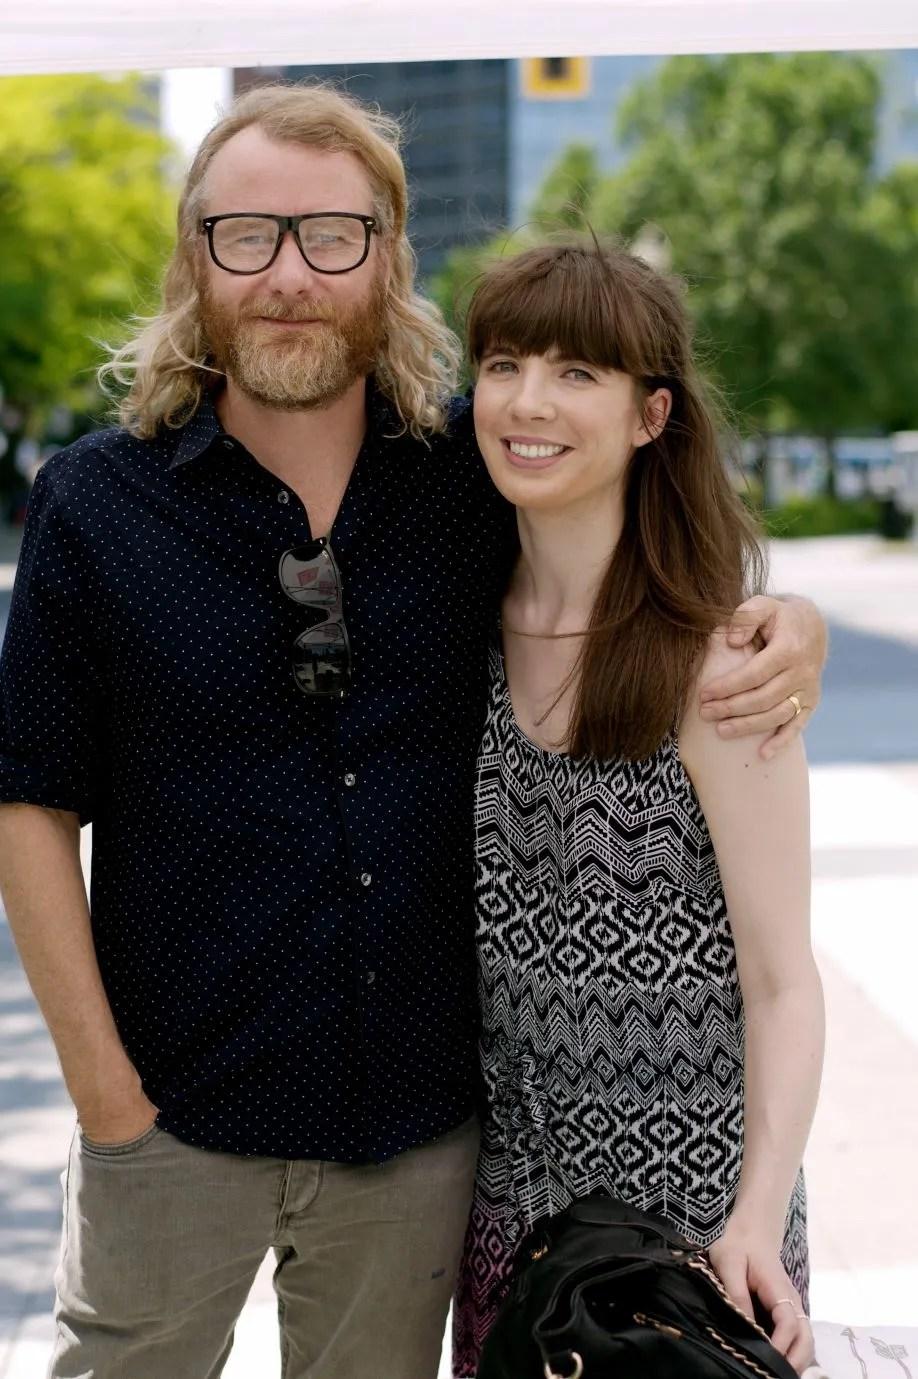 Matt Berninger and Kristin Archer. Photo by Lisa Vuyk